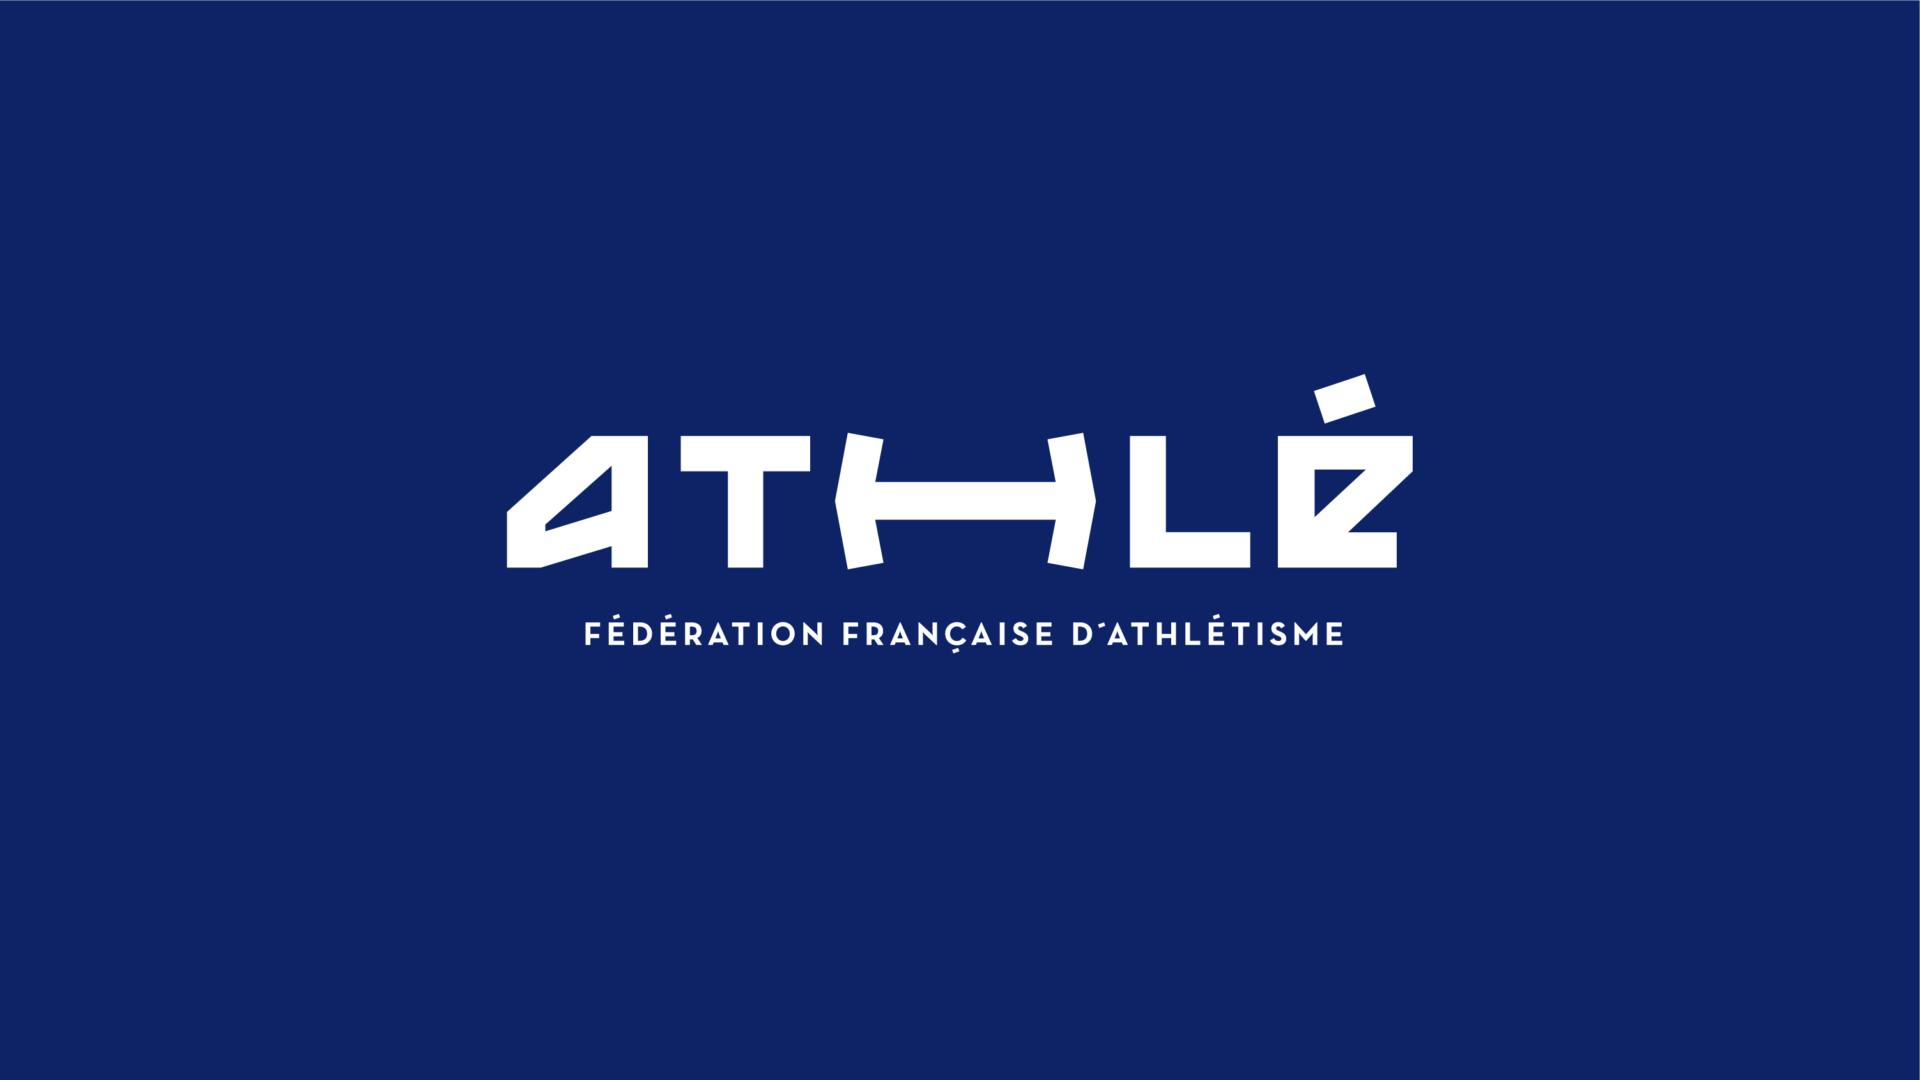 Crédit: Fédération Française d'Athlétisme (FFA)